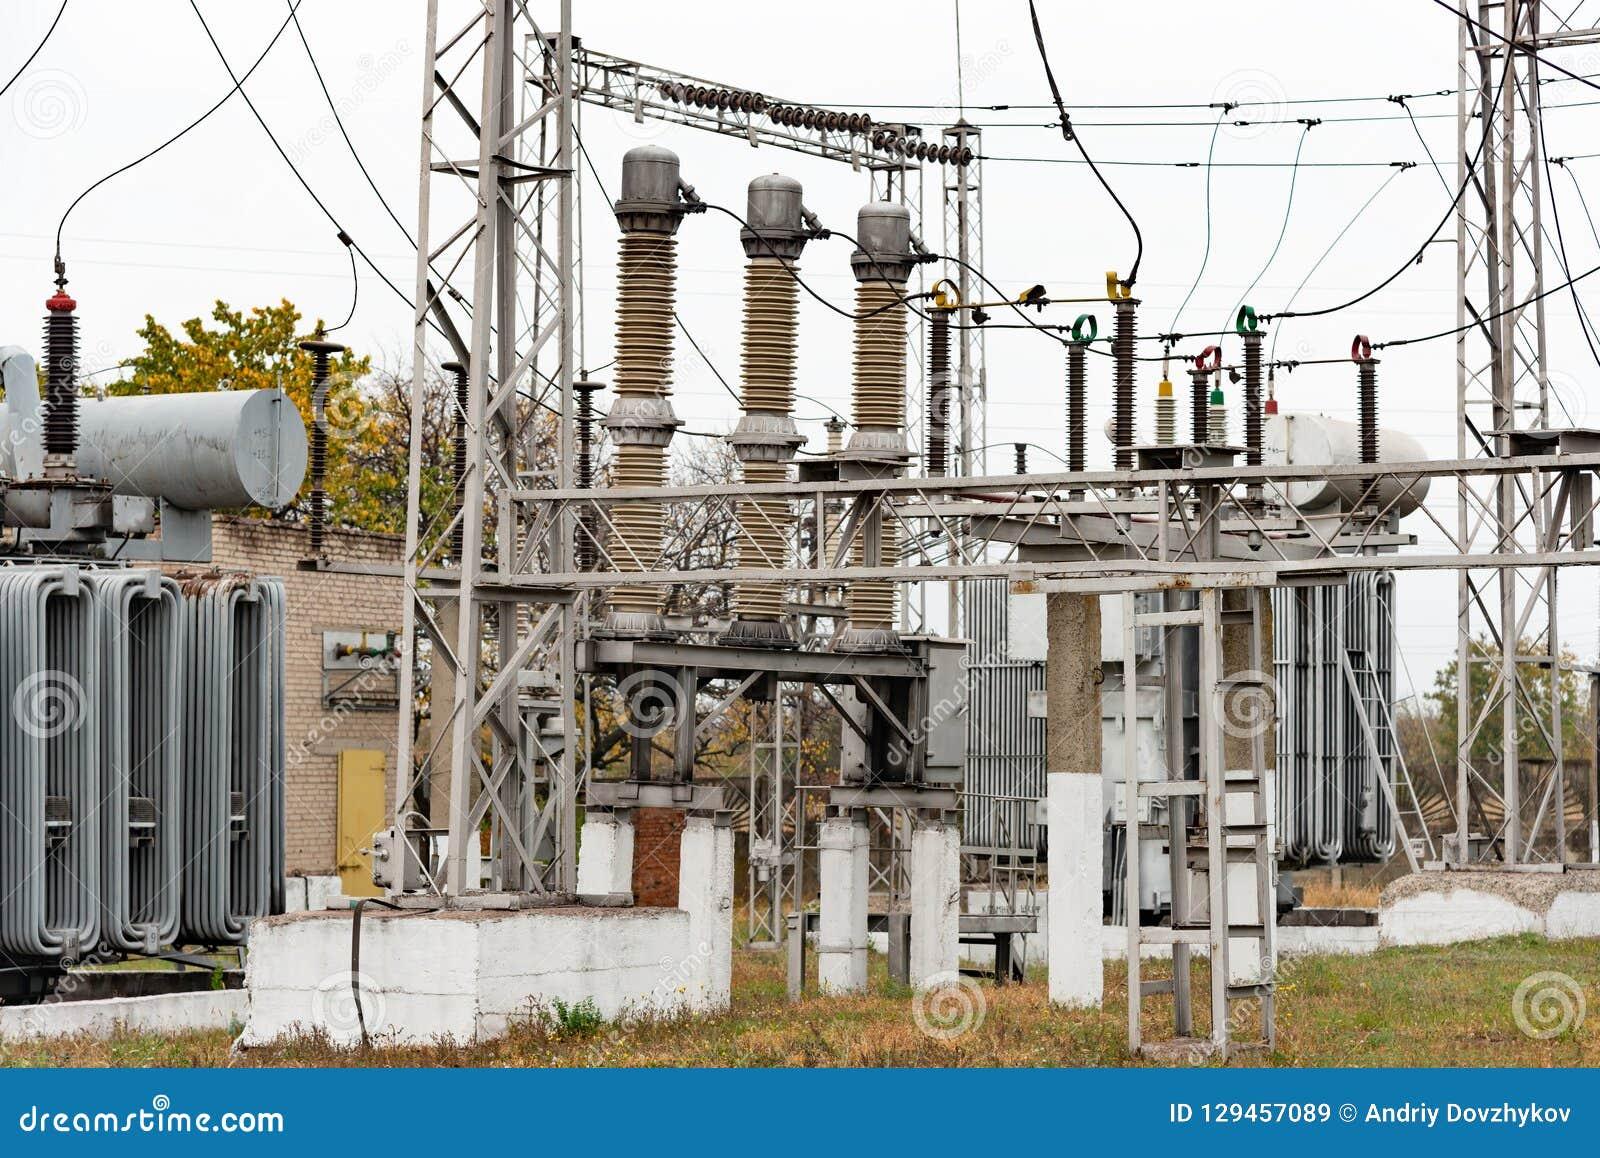 Transformer substation, high-voltage switchgear and equipment.